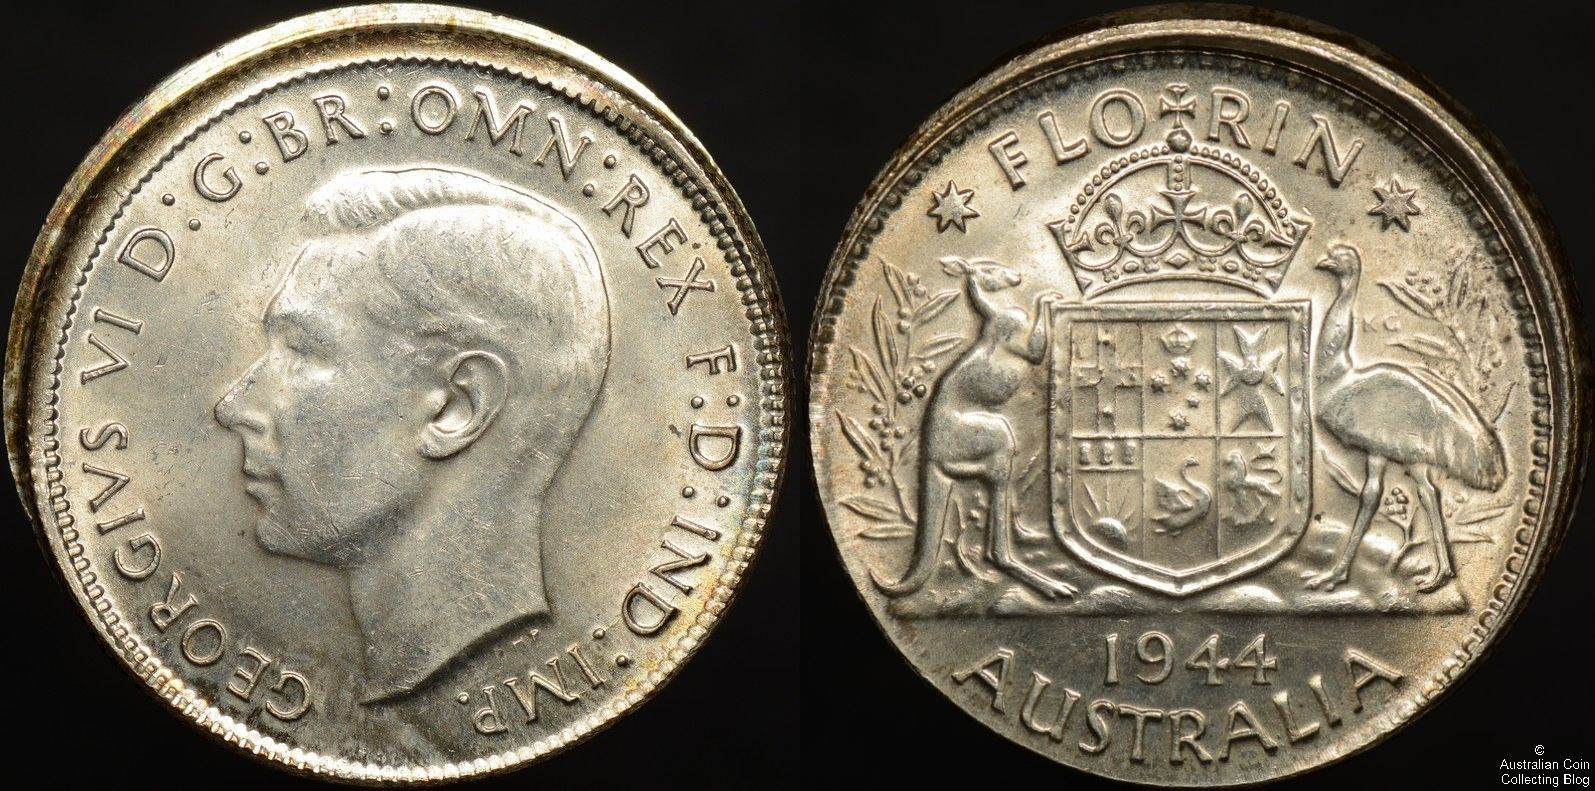 AUSTRALIA 1958 QUEEN ELIZABETH II SILVER THREEPENCE